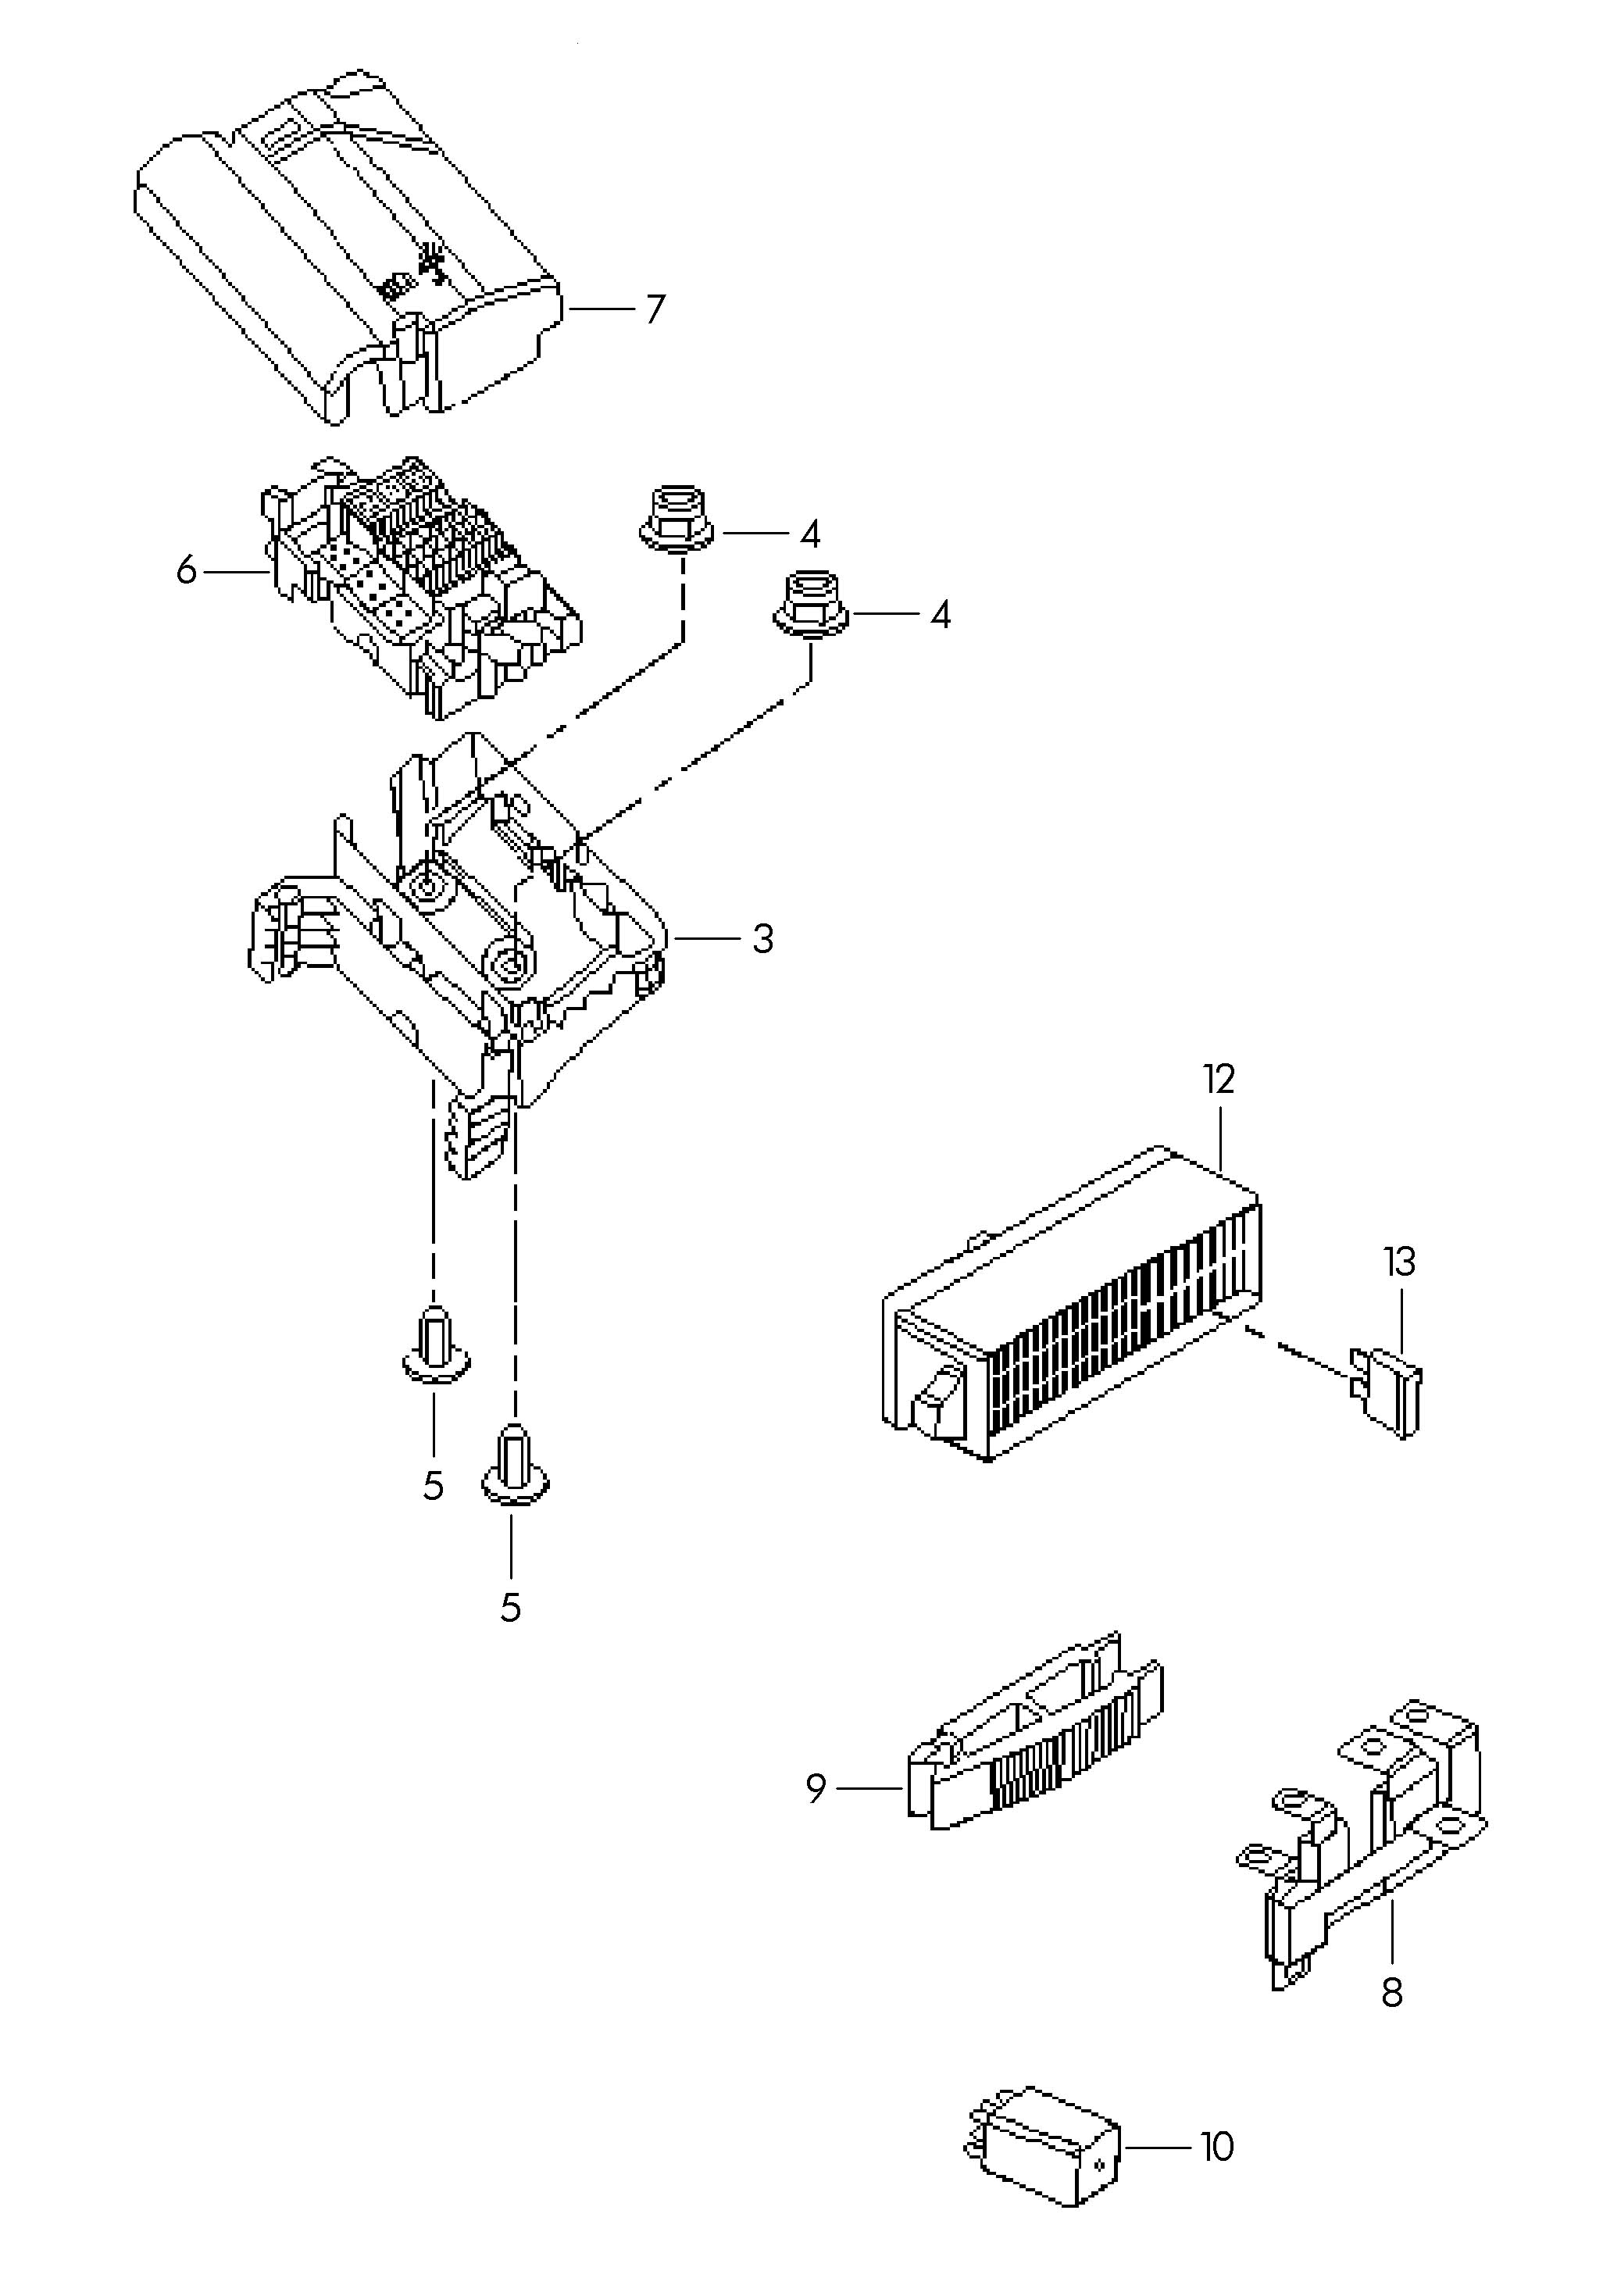 2012 volkswagen jetta multi-fuse  fuses  multifuse